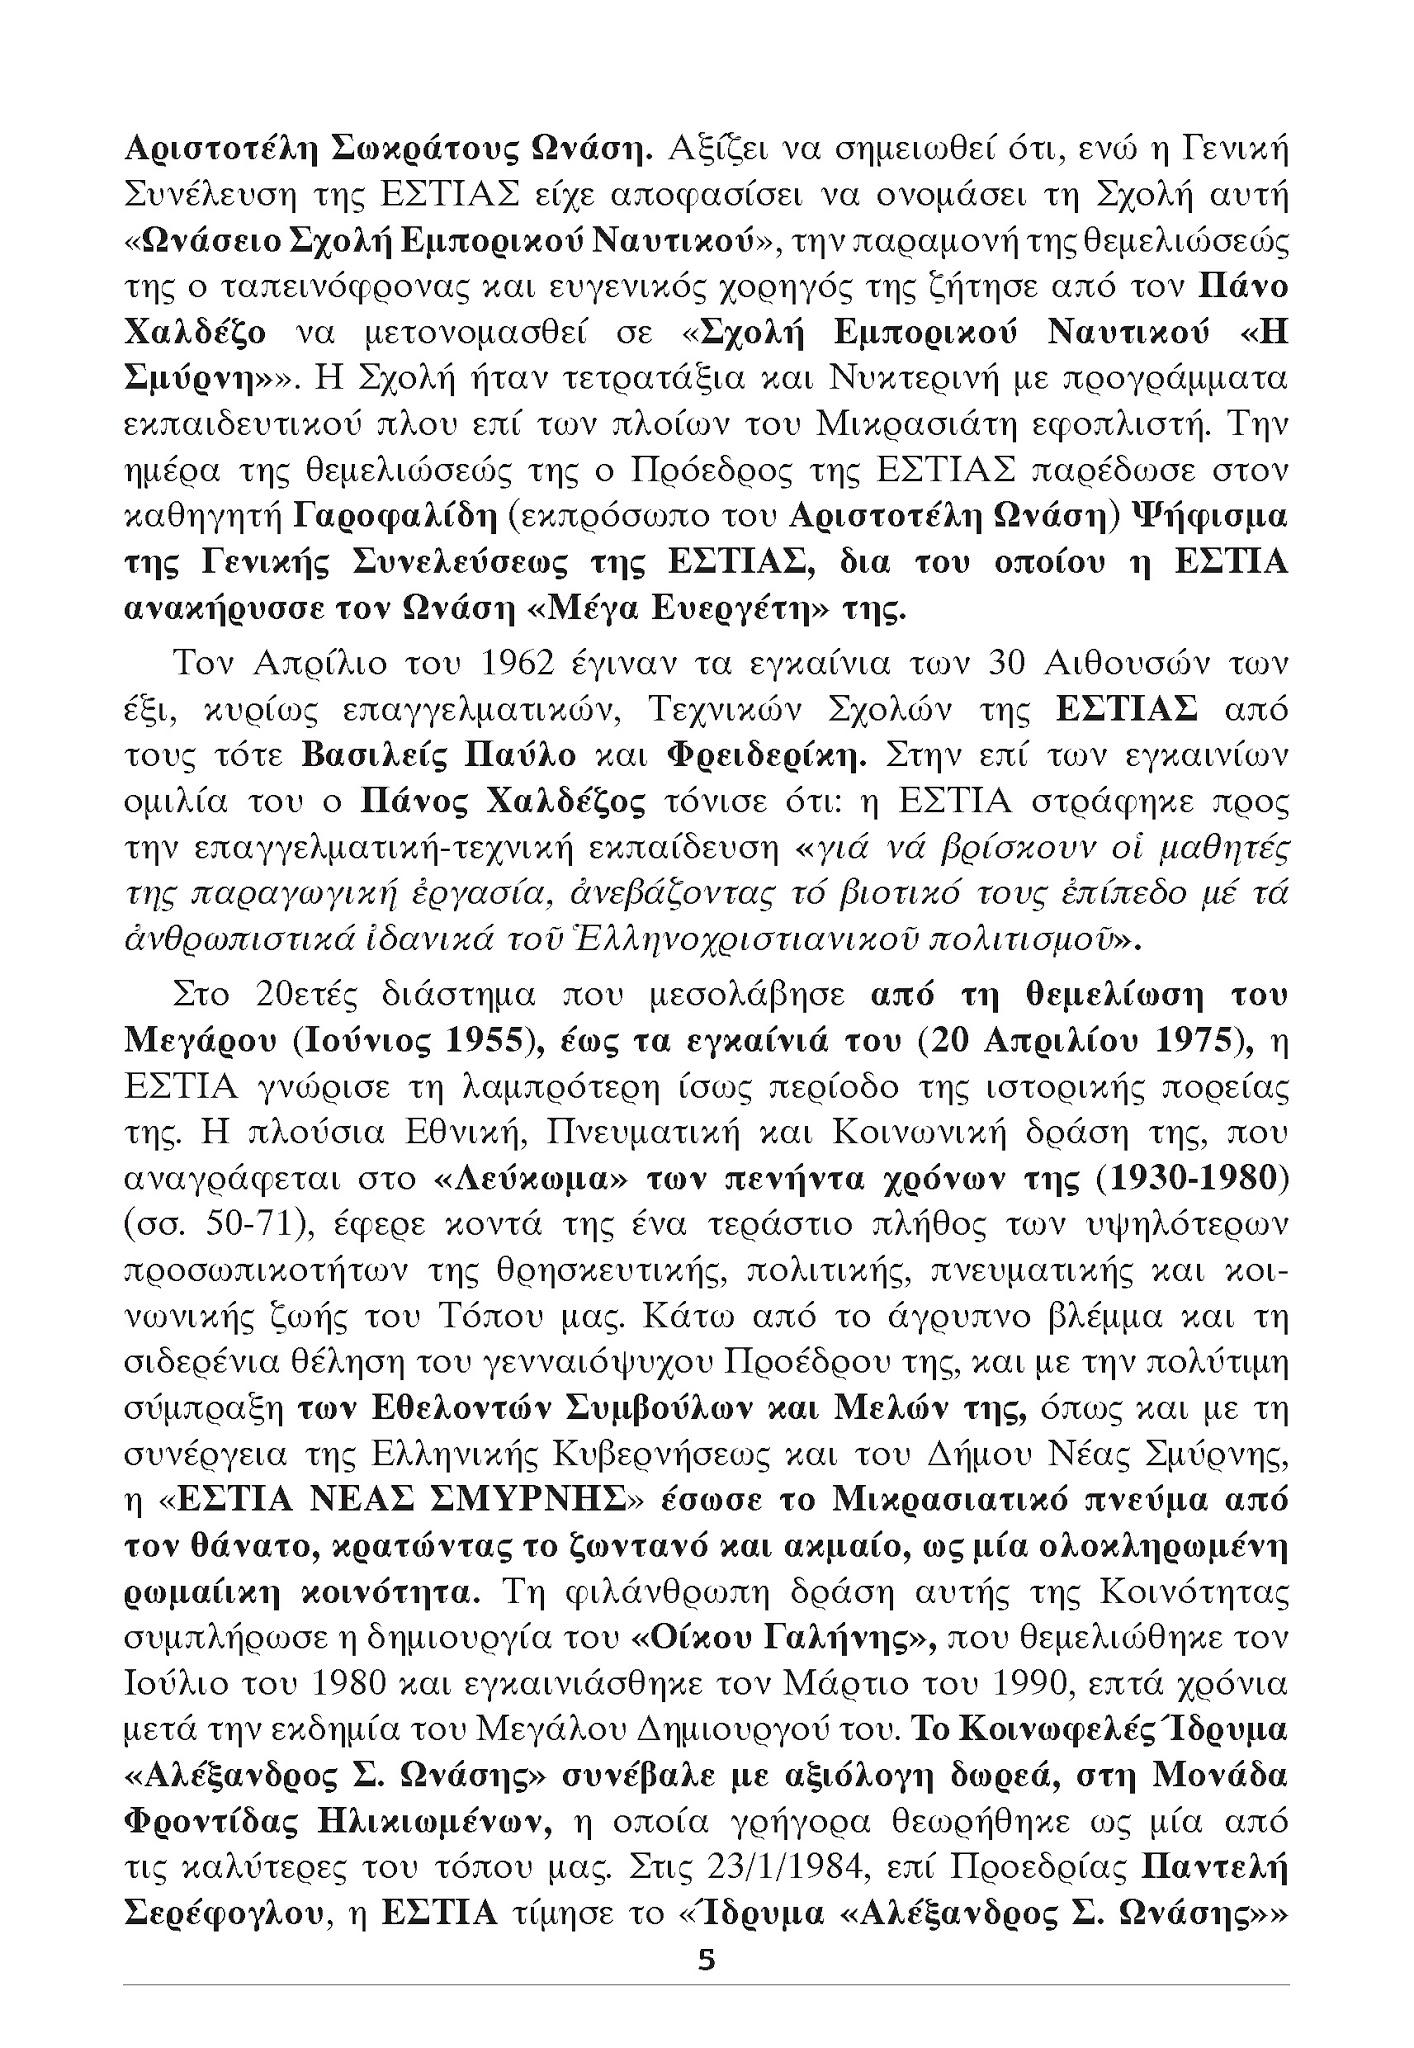 Photo: ΕΣΤΙΑ ΝΕΑΣ ΣΜΥΡΝΗΣ: «Το θαύμα της Πίστης στις Αθάνατες αξίες, στον Εθελοντισμό και στη Συλλογικότητα», της Βιργινίας Χαμουδοπούλου-Κωνσταντινίδου, Γενικής Γραμματέως της Εστίας, Δεκέμβριος 2015, σελ. 5.